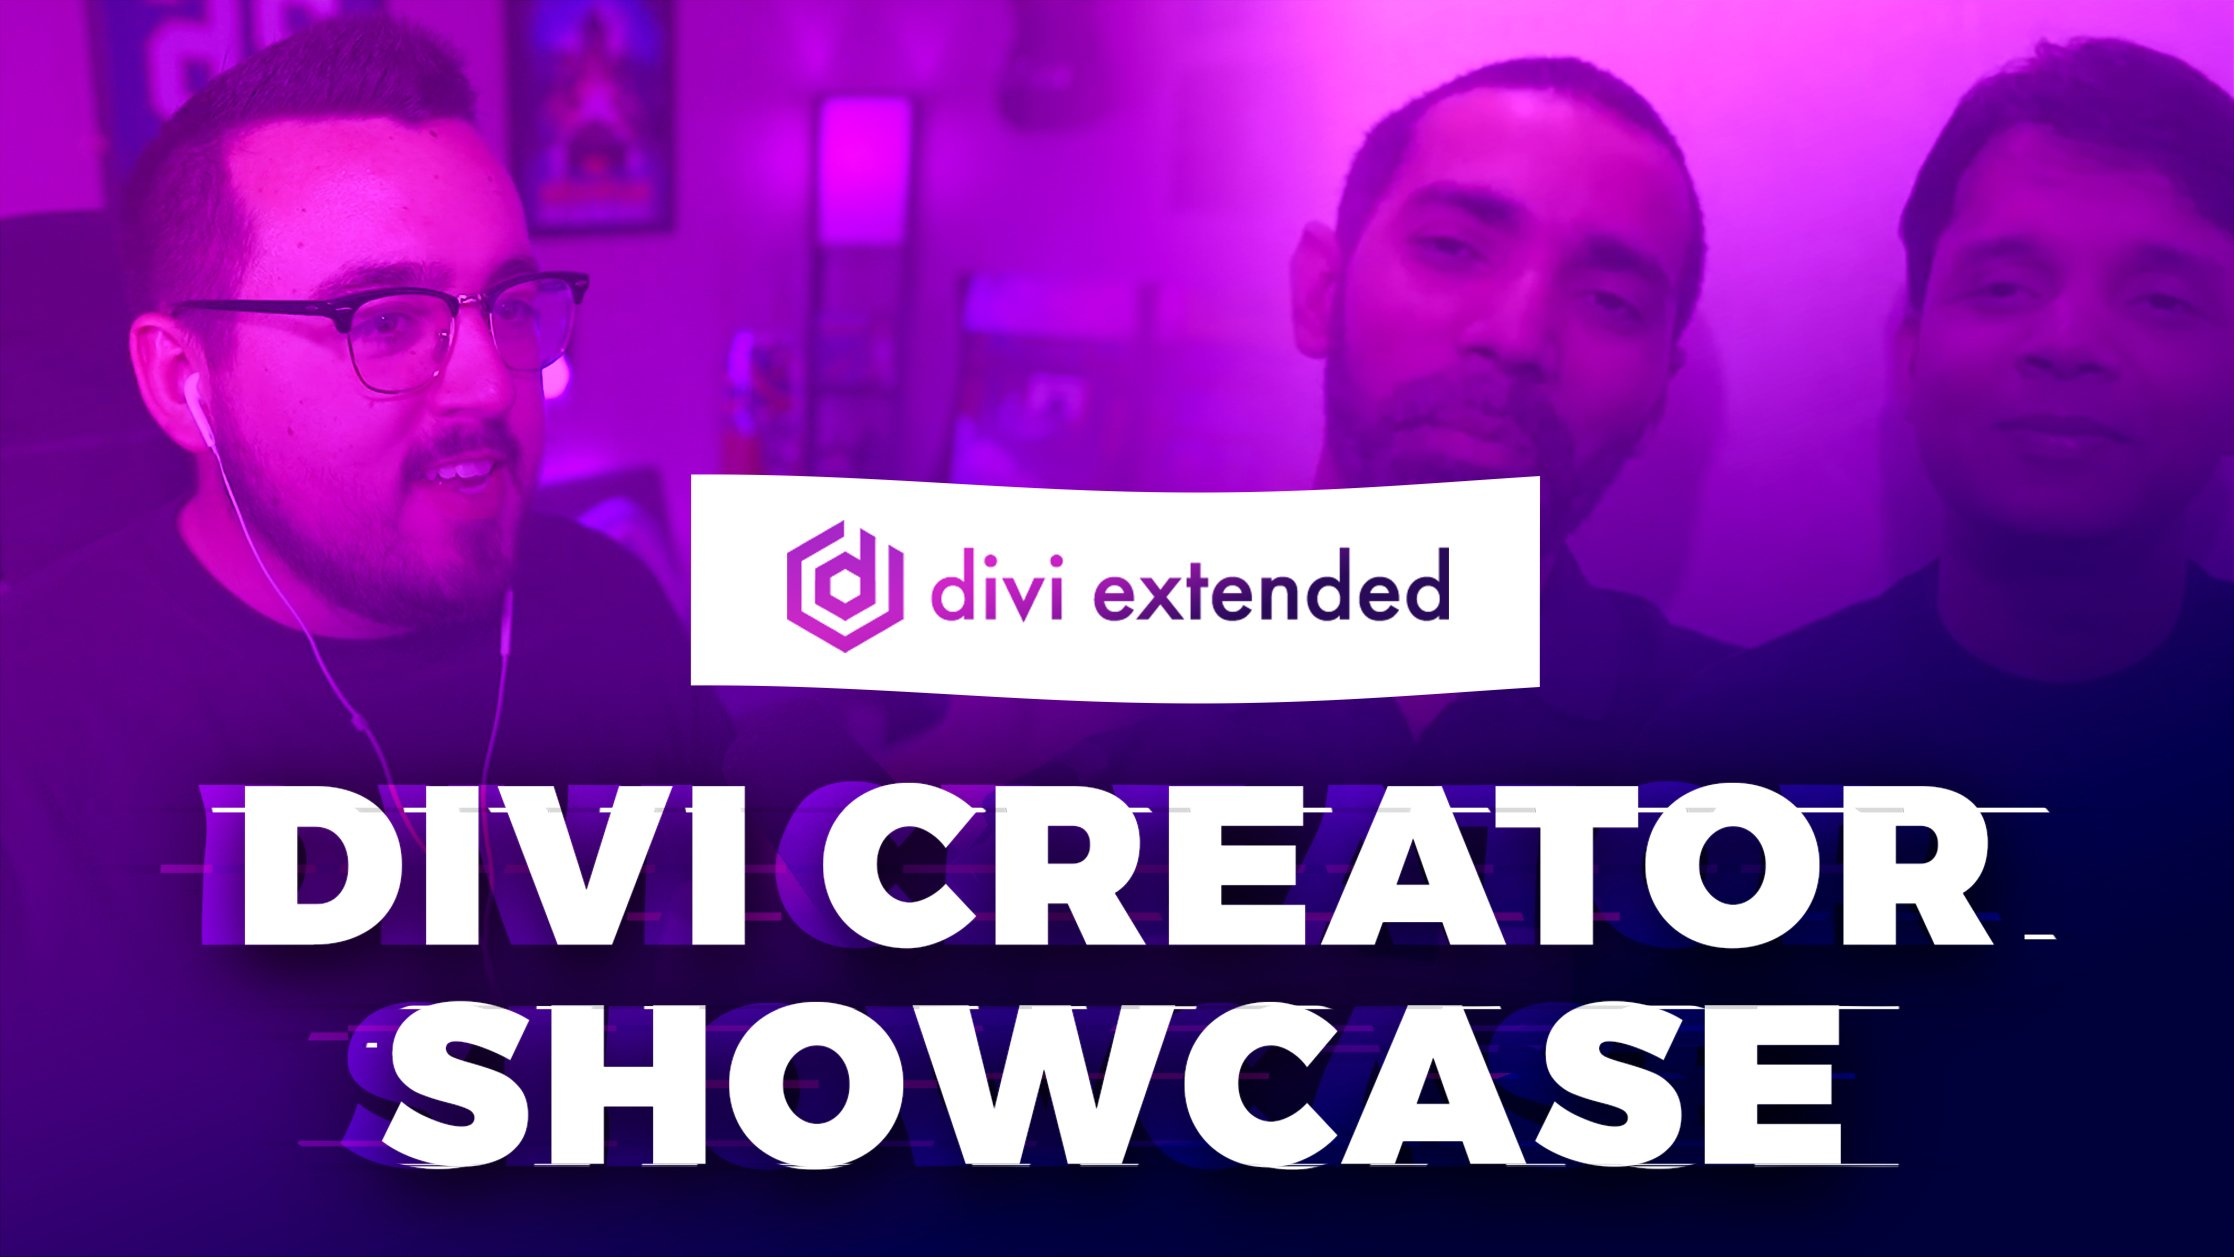 Divi Creator Showcase: Divi Extended